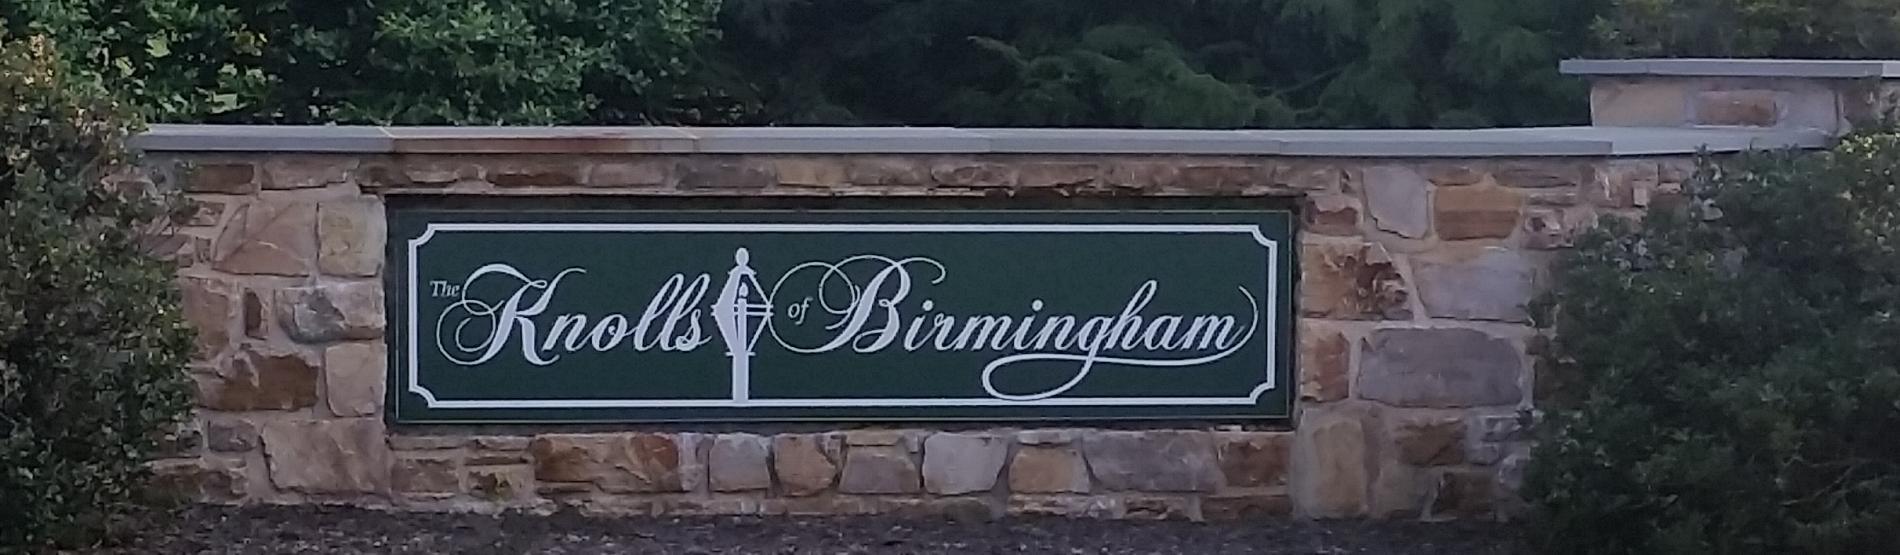 Knolls of Birmingham Community Entrance Sign.